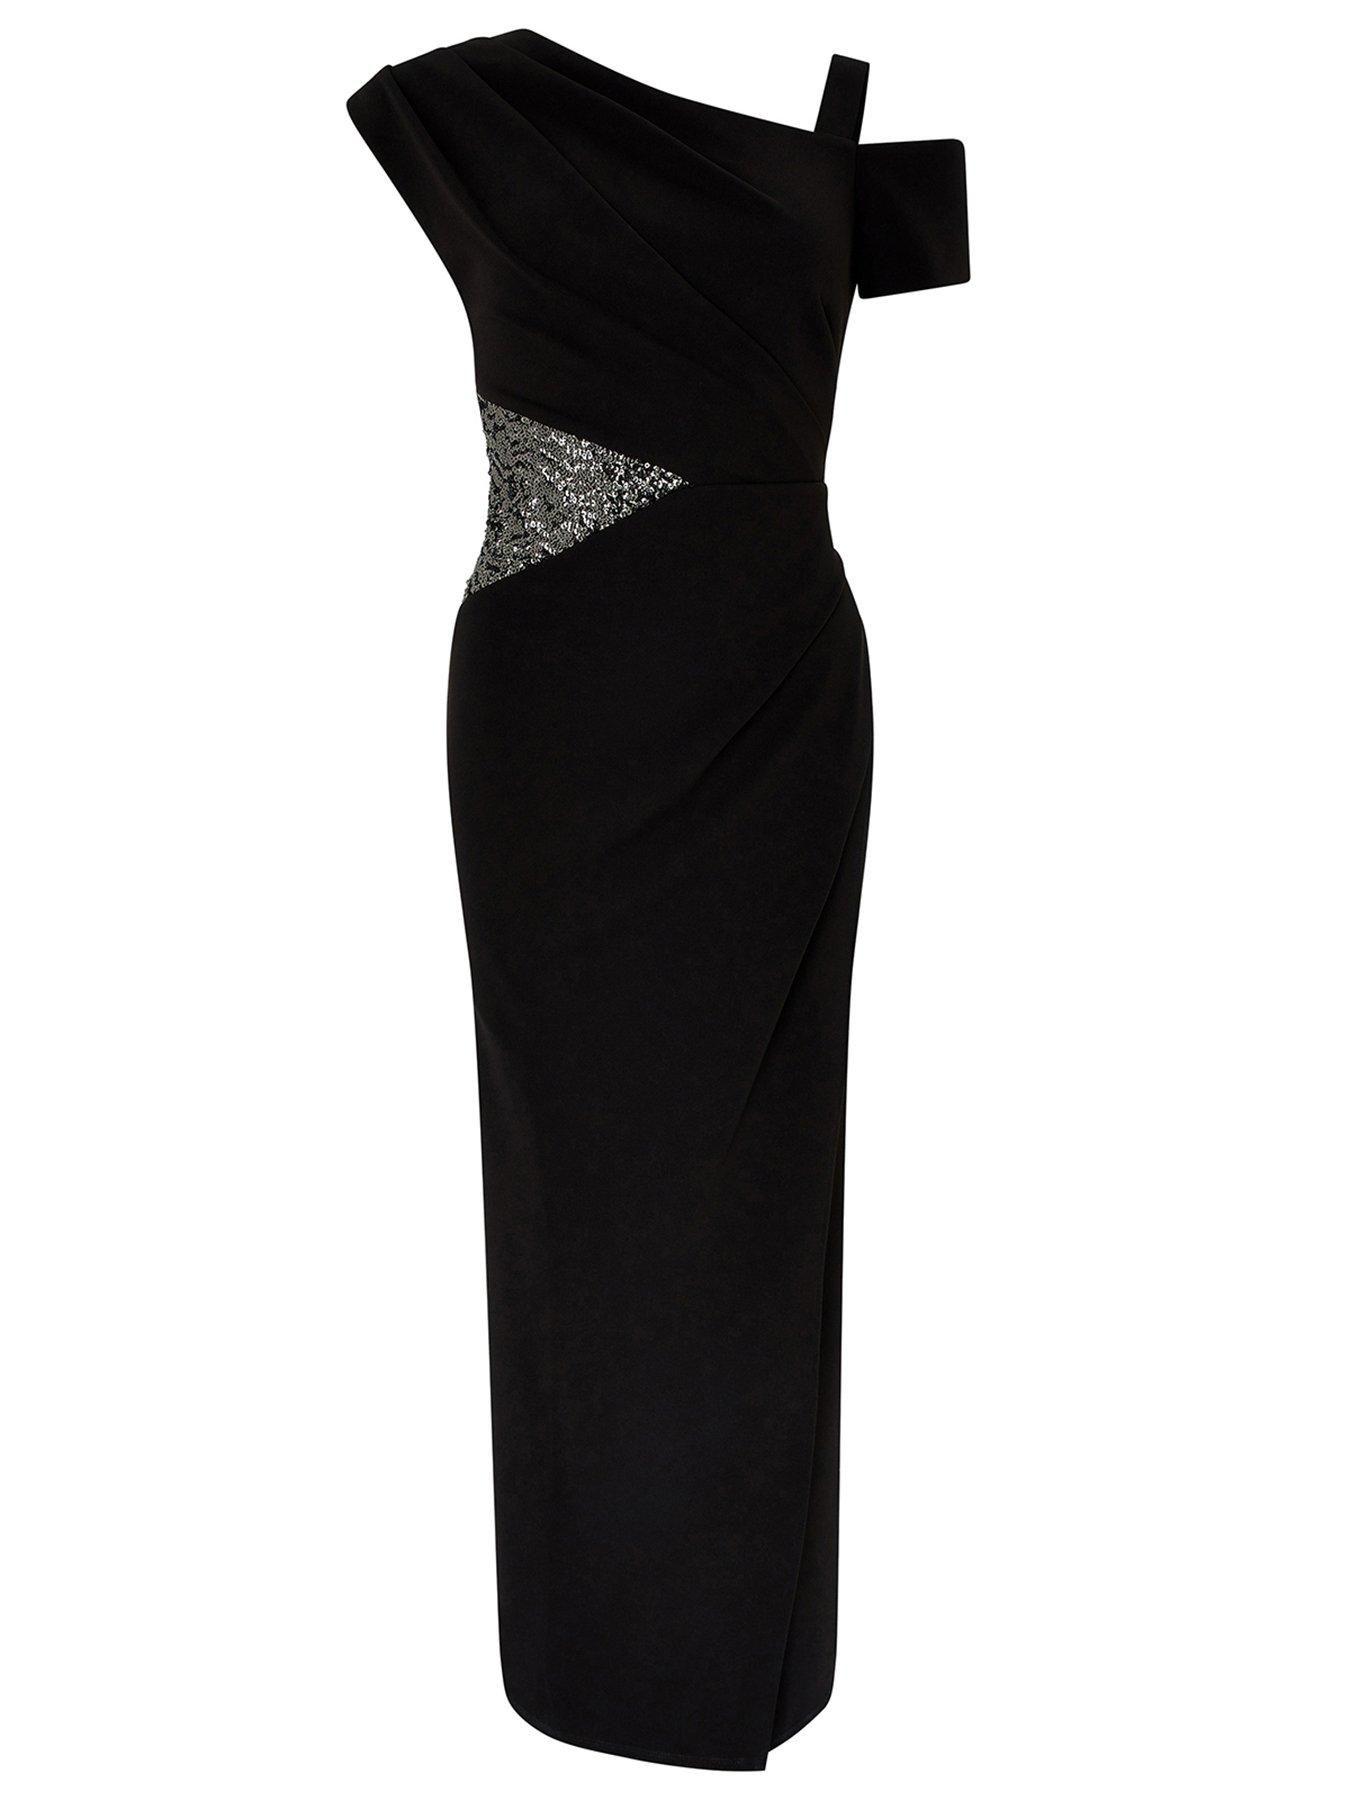 Monsoon Monsoon Octavia Sequin Insert Maxi Dress, Black, Size 20, Women - Black - 20 #blackmaxidress